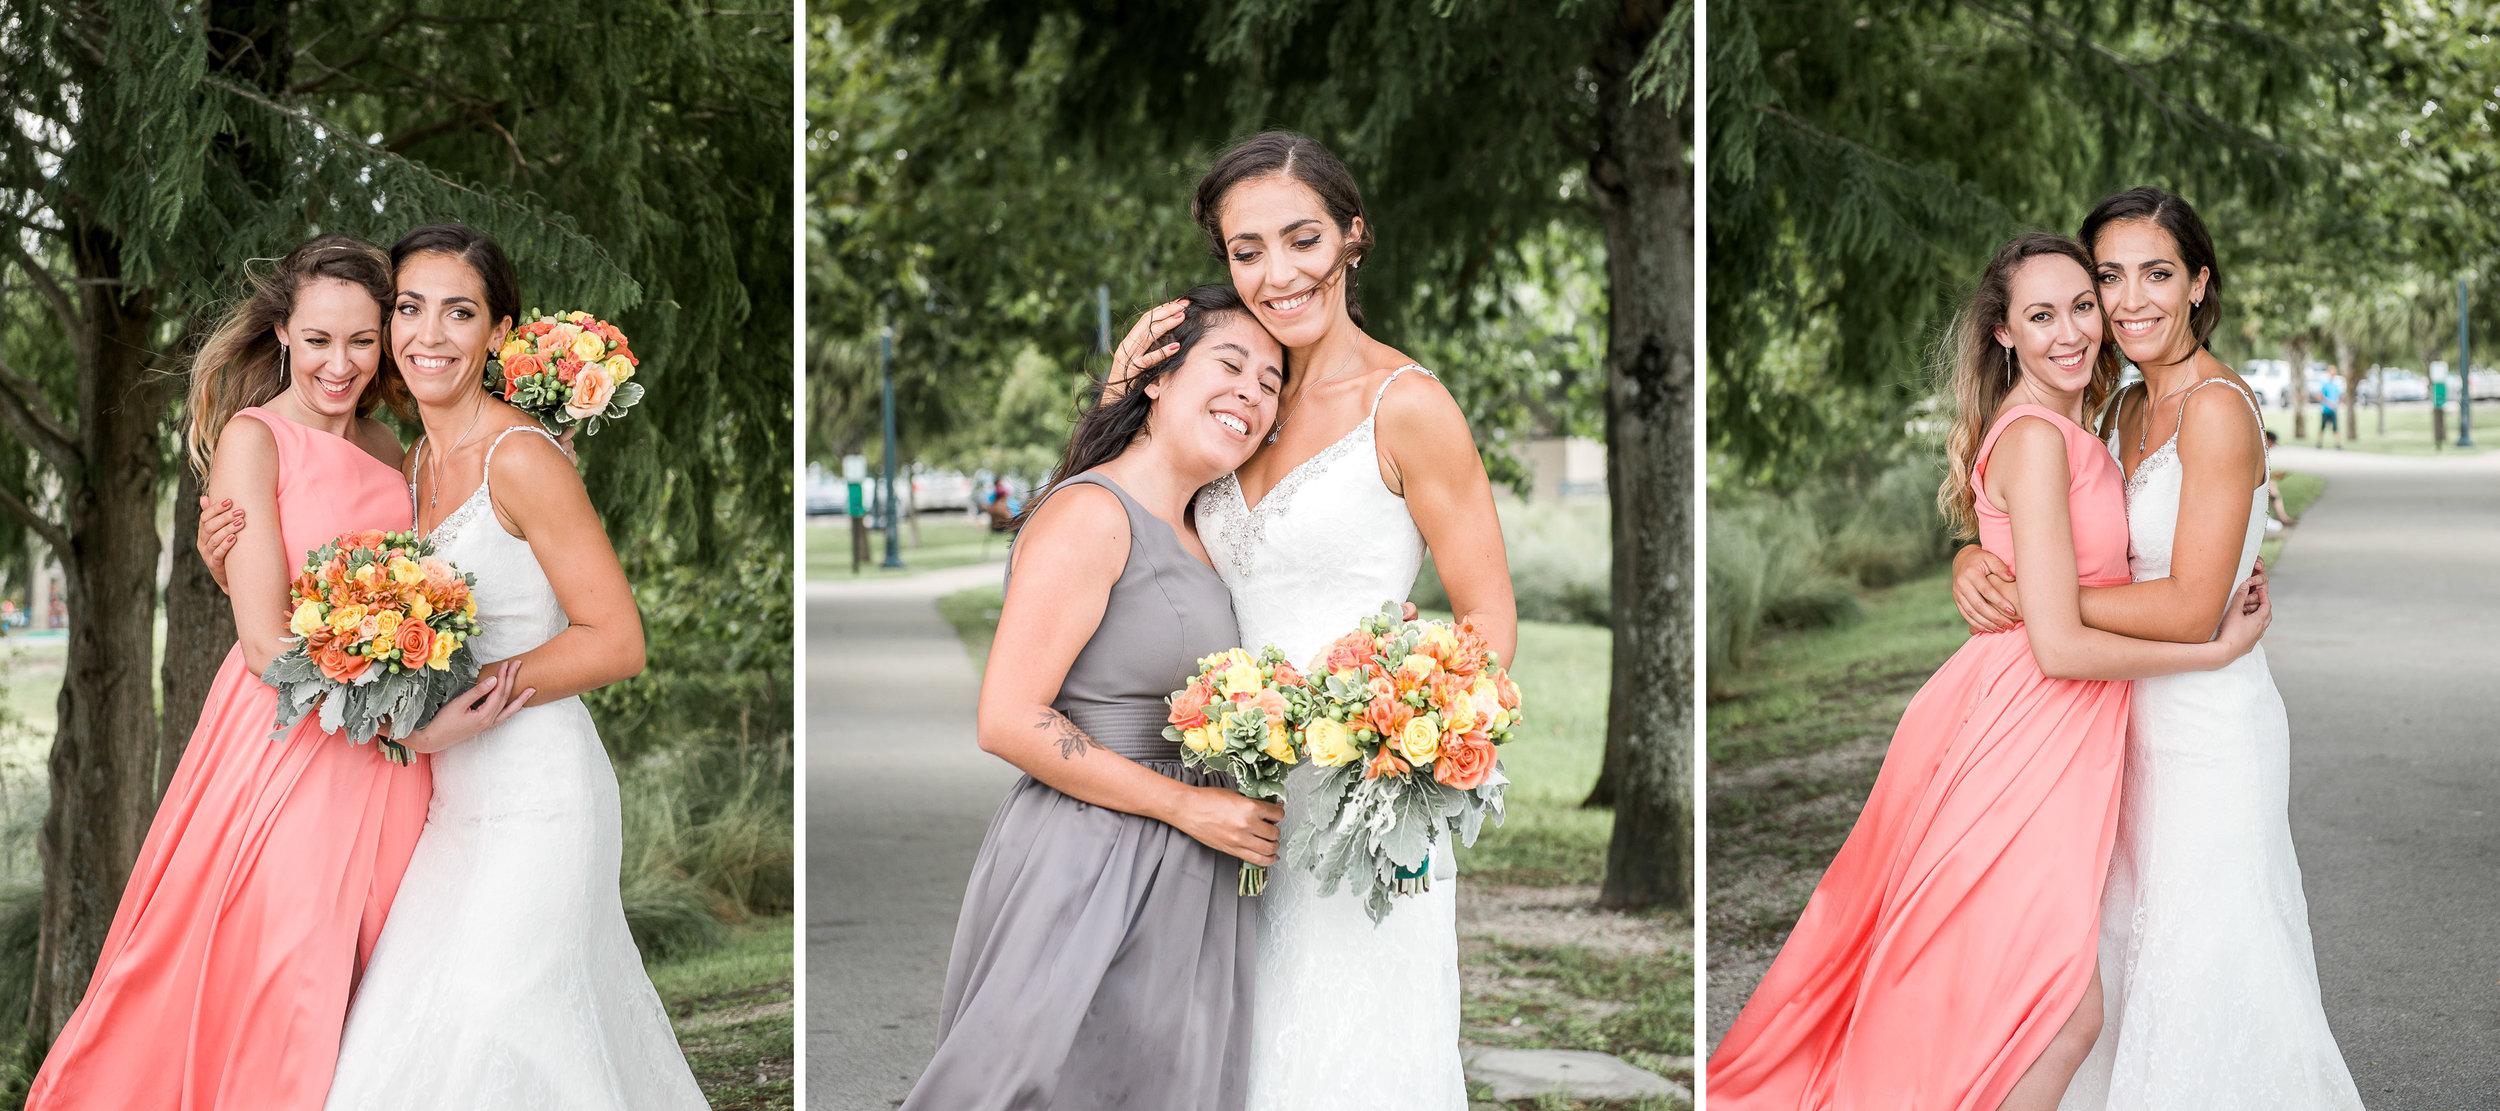 KateTaramykinStudios-Kissimmee-Wedding-Arzola-16.jpg